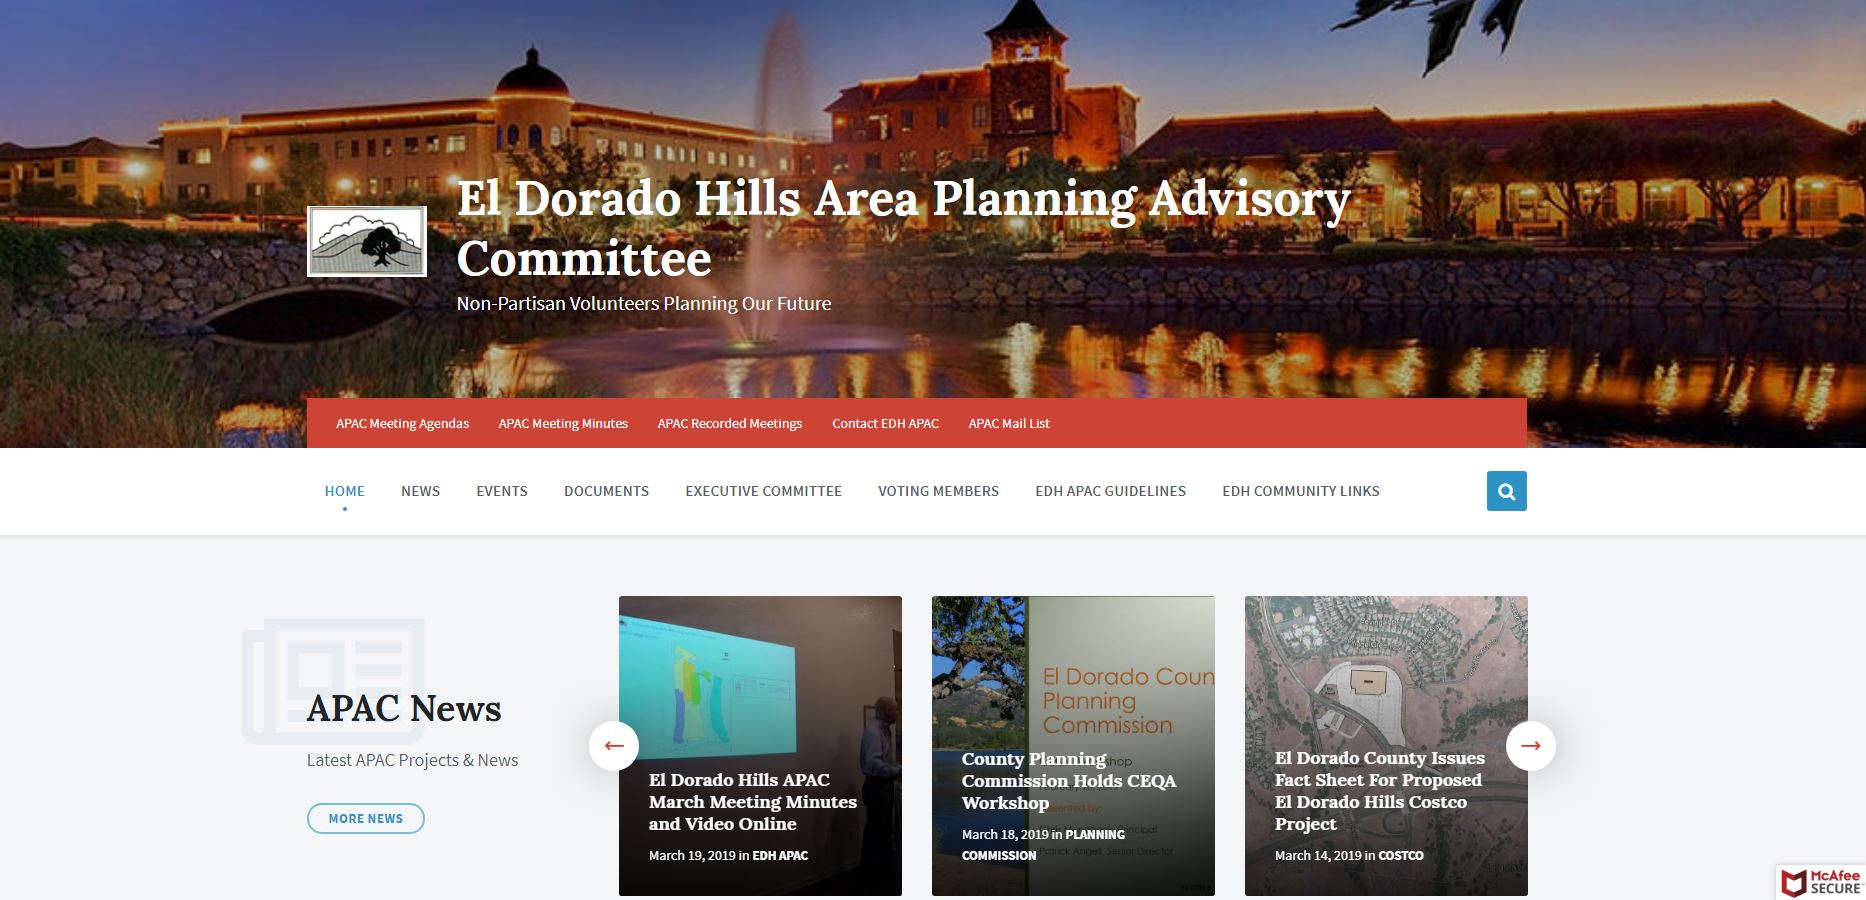 Apachome El Dorado Hills Area Planning Advisory Committee